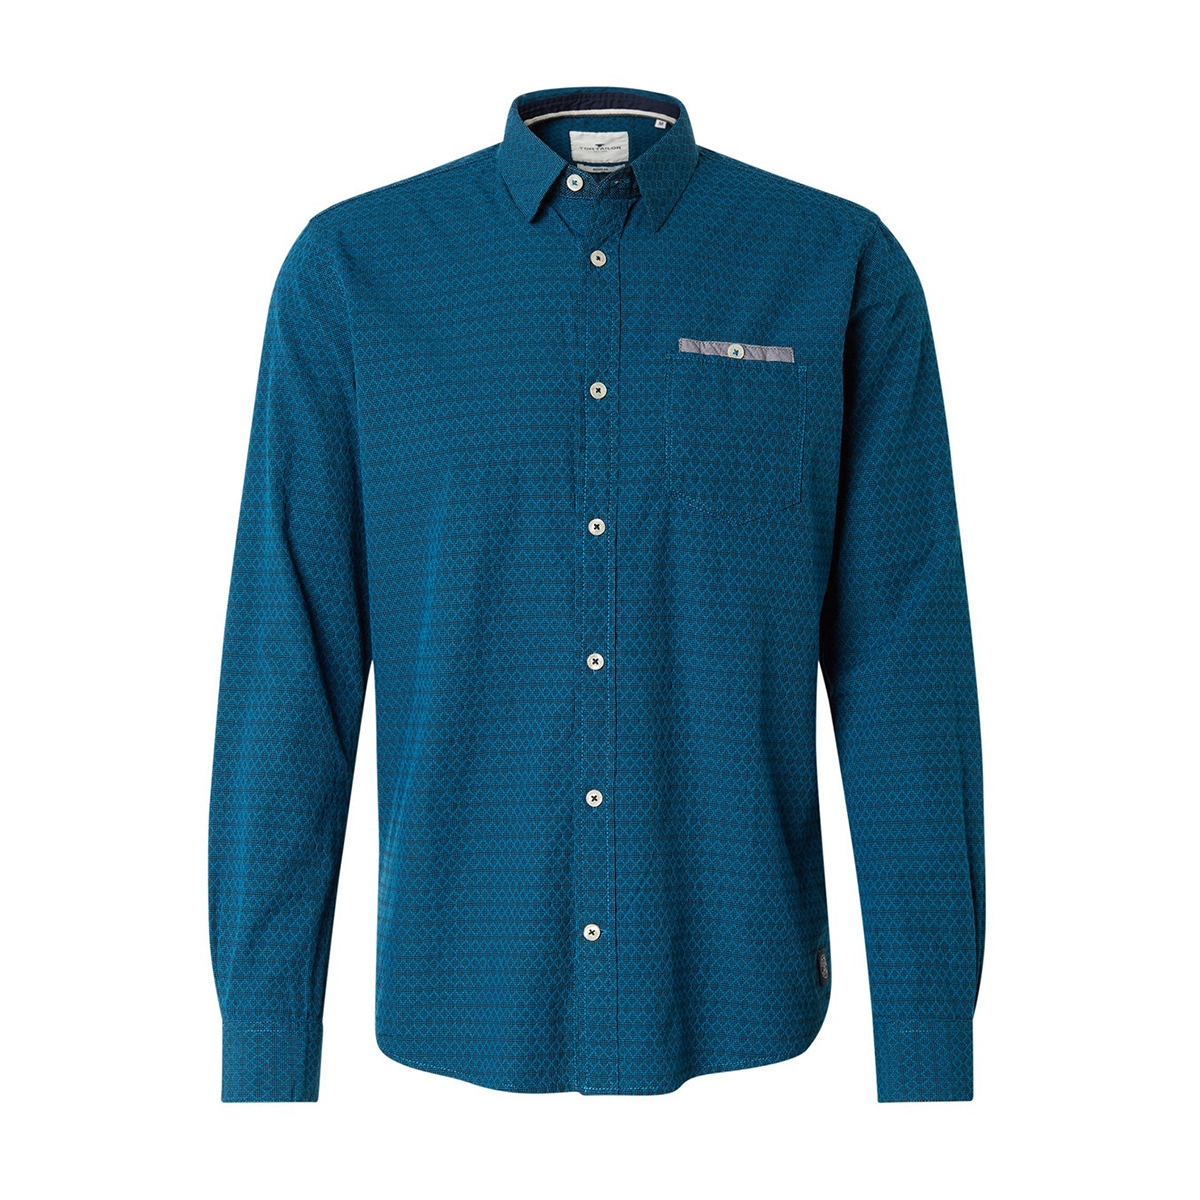 overhemd met patroon 1014475xx10 tom tailor overhemd 20174